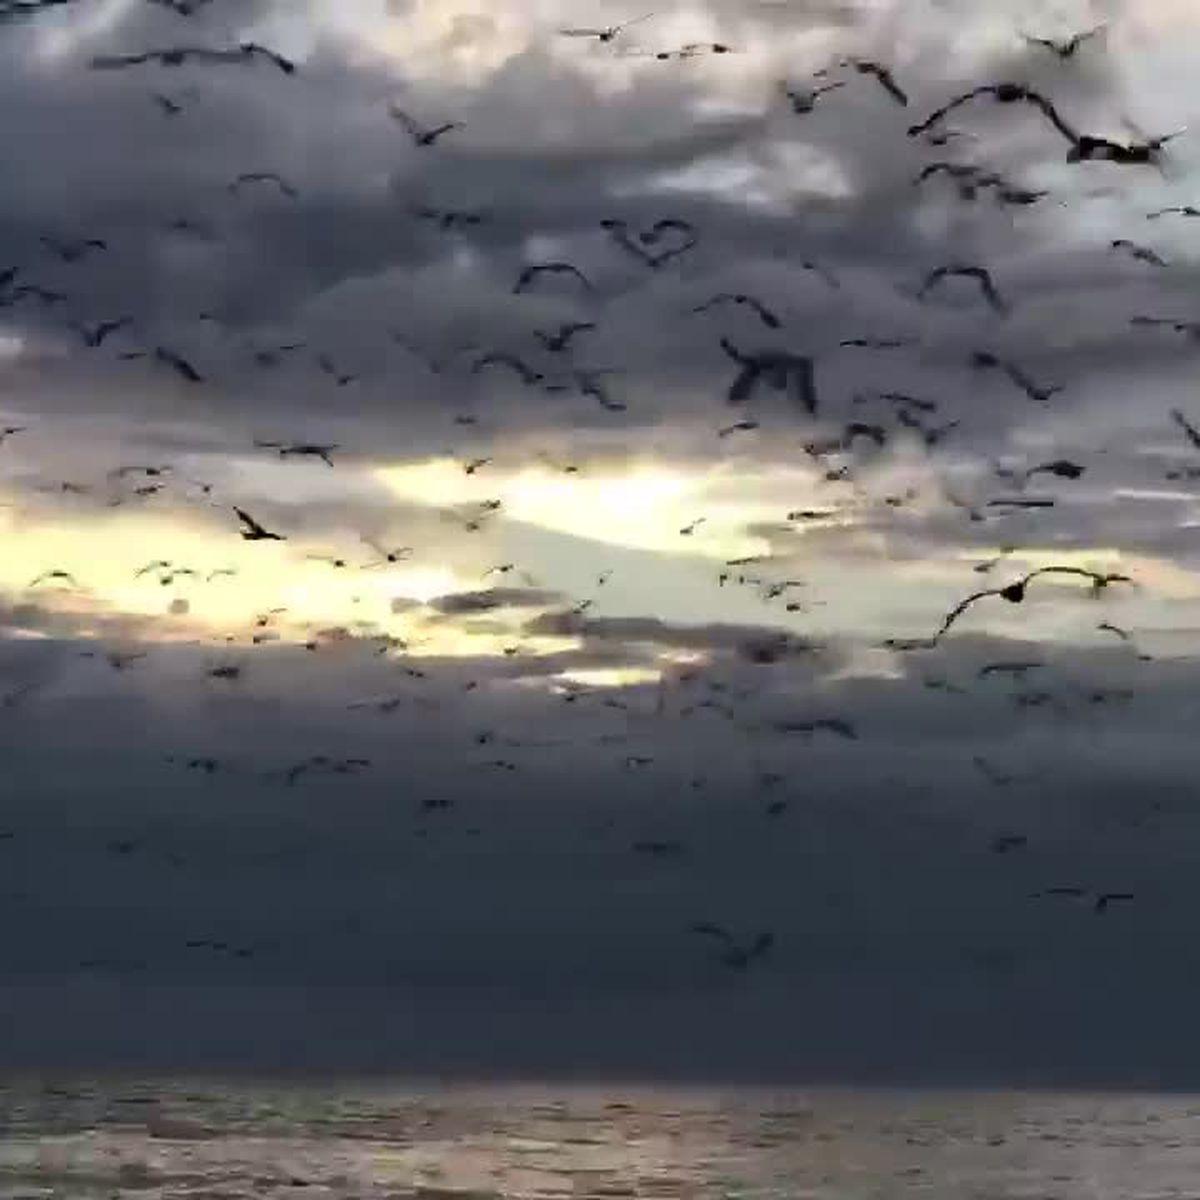 VIDEO: Hundreds of birds take off from beach on Siesta Key